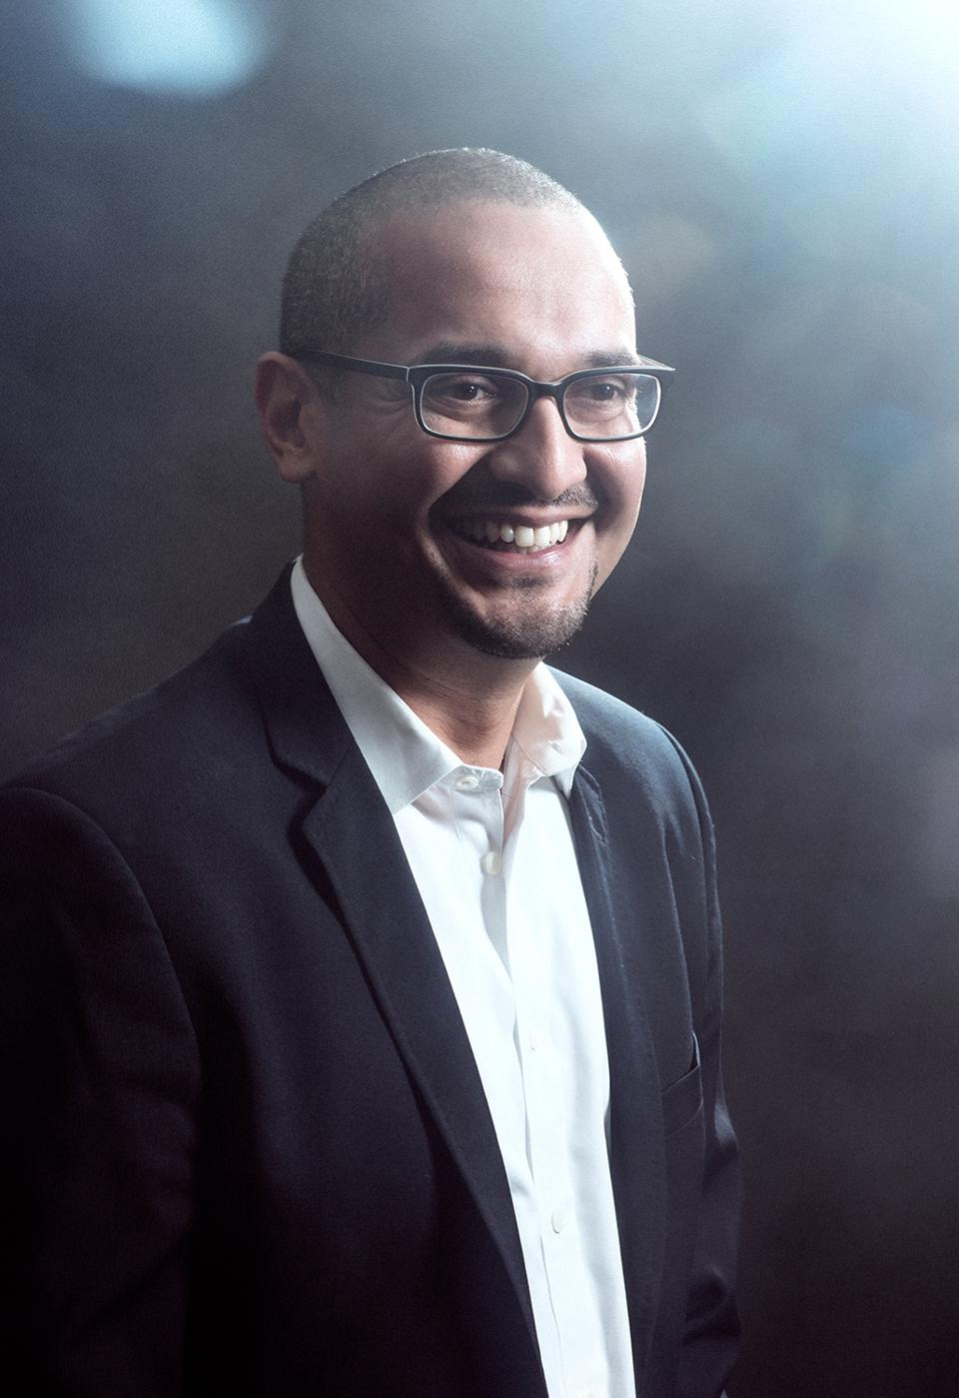 Illumina Chief Executive Francis deSouza